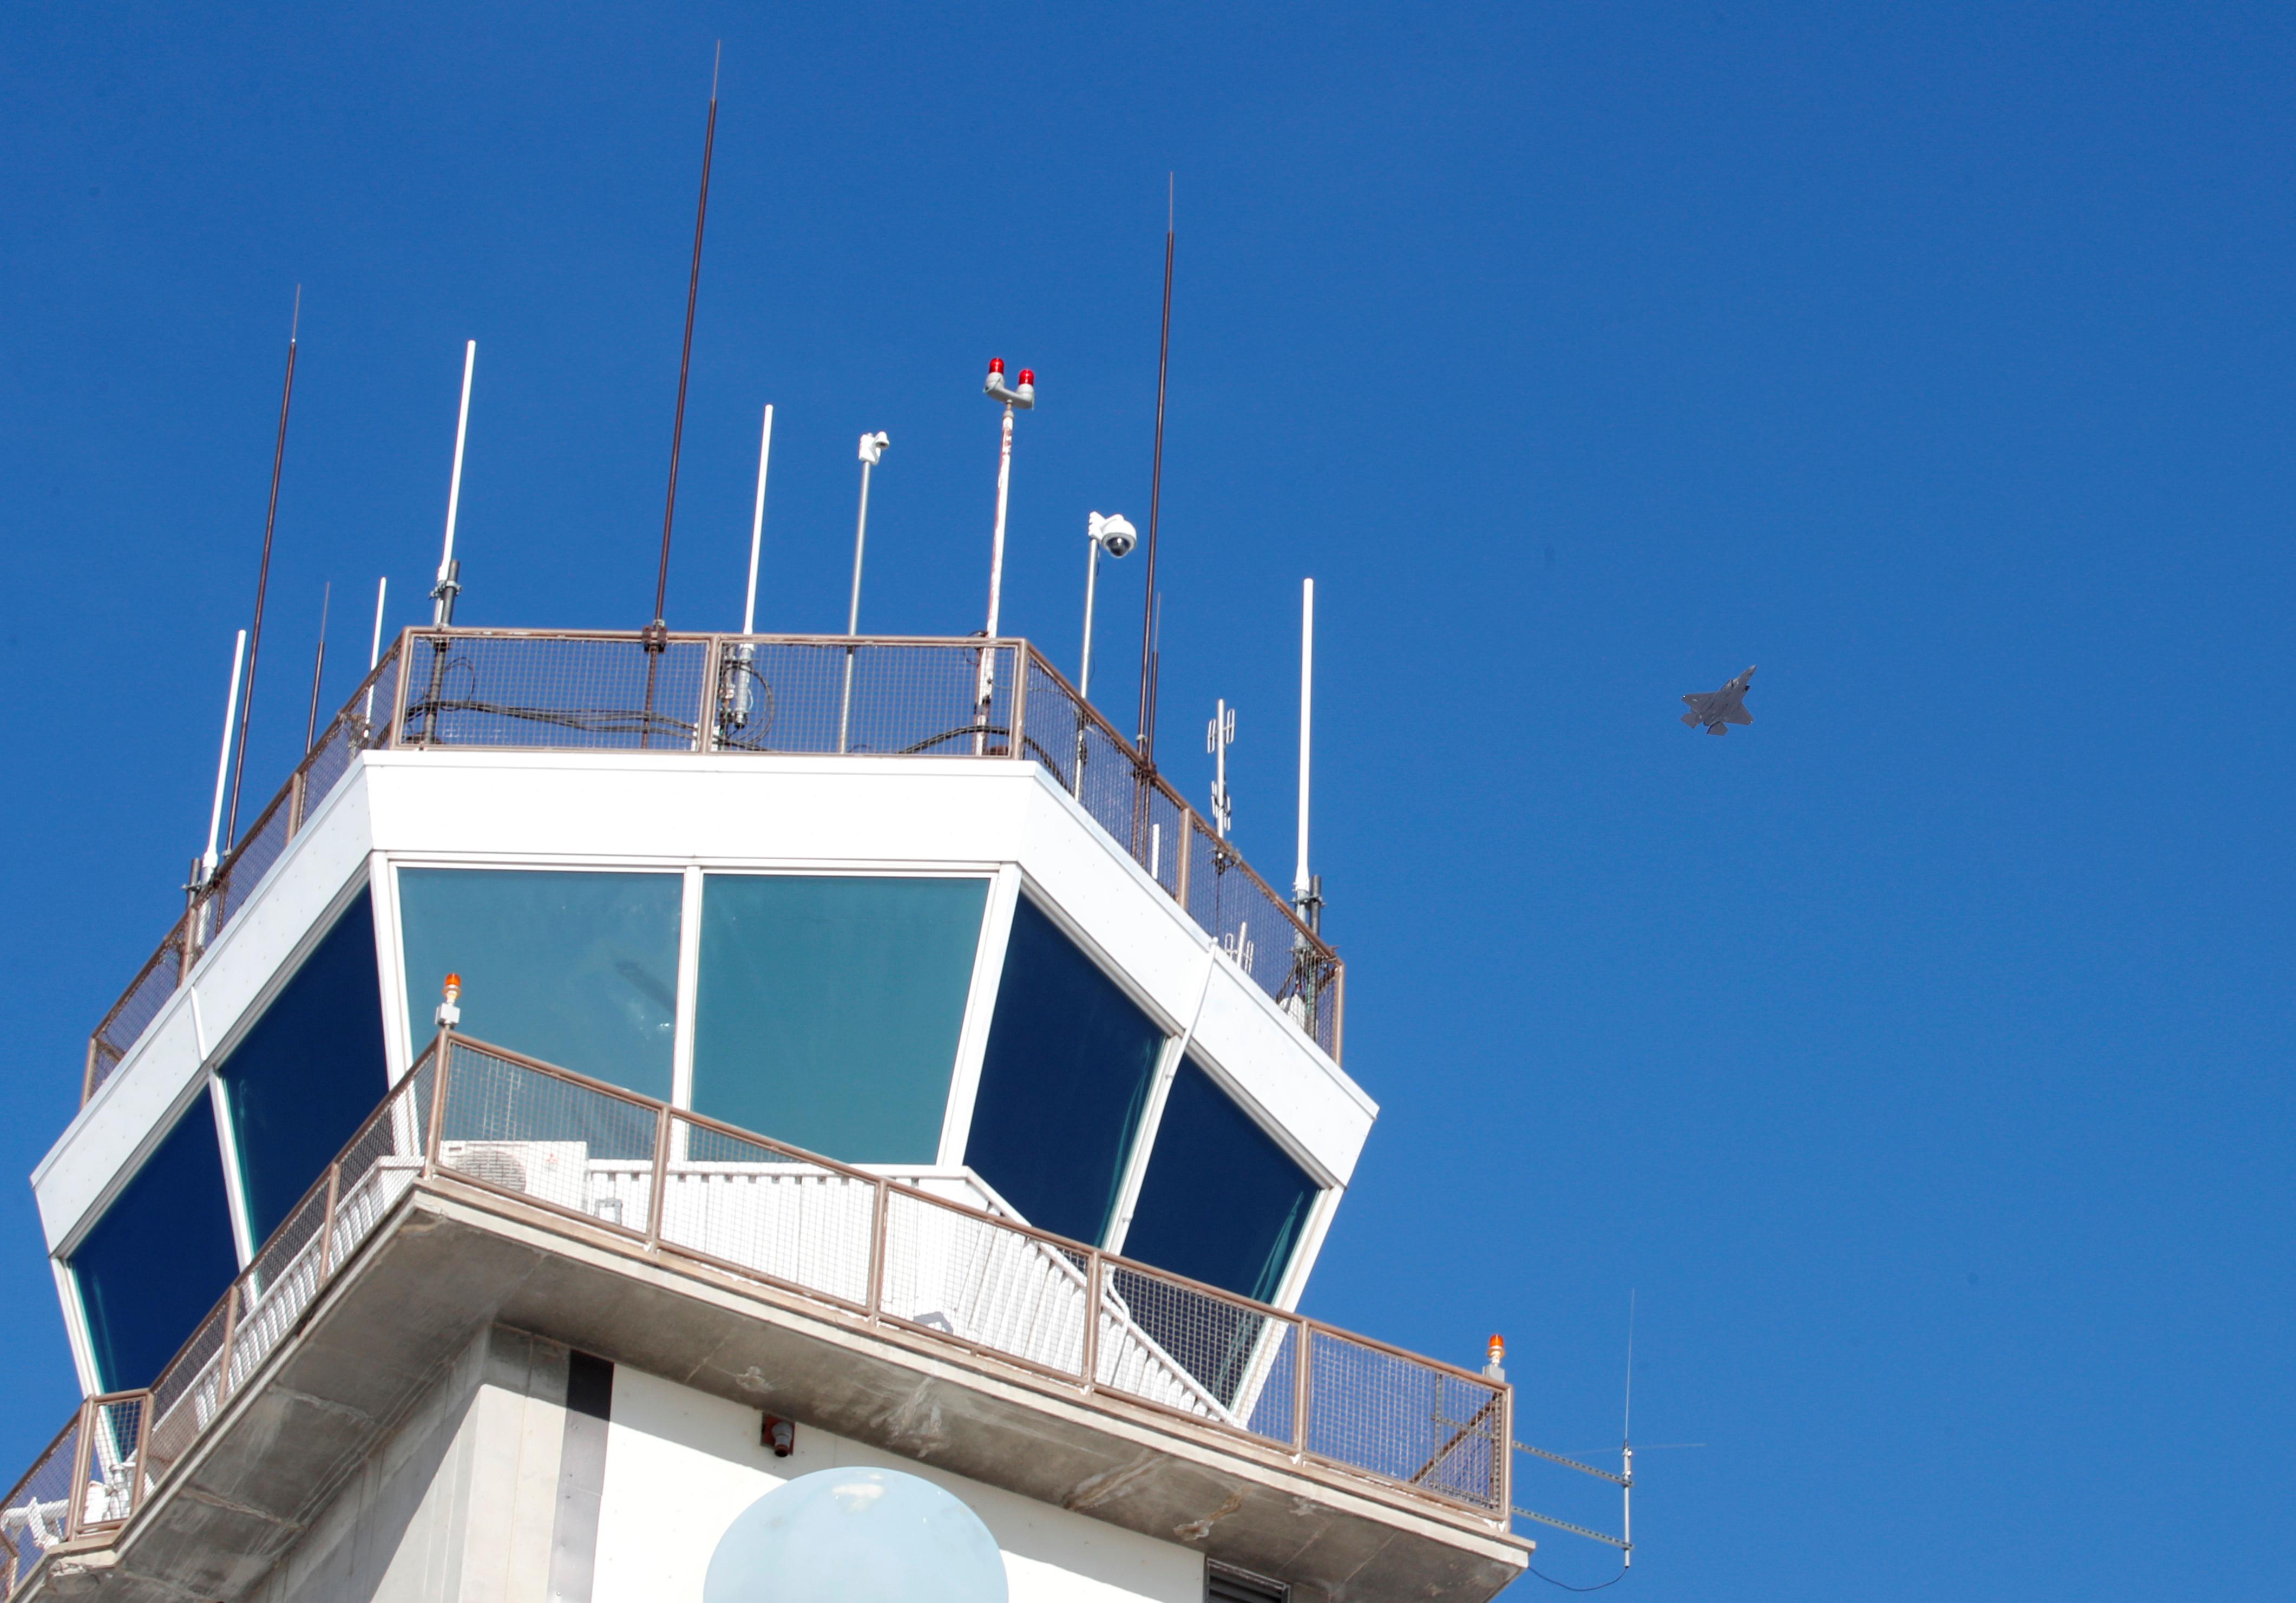 La torre de control de la Base Aérea Hill, en Utah. Detrás, un F-35 atraviesa el cielo (Reuters)